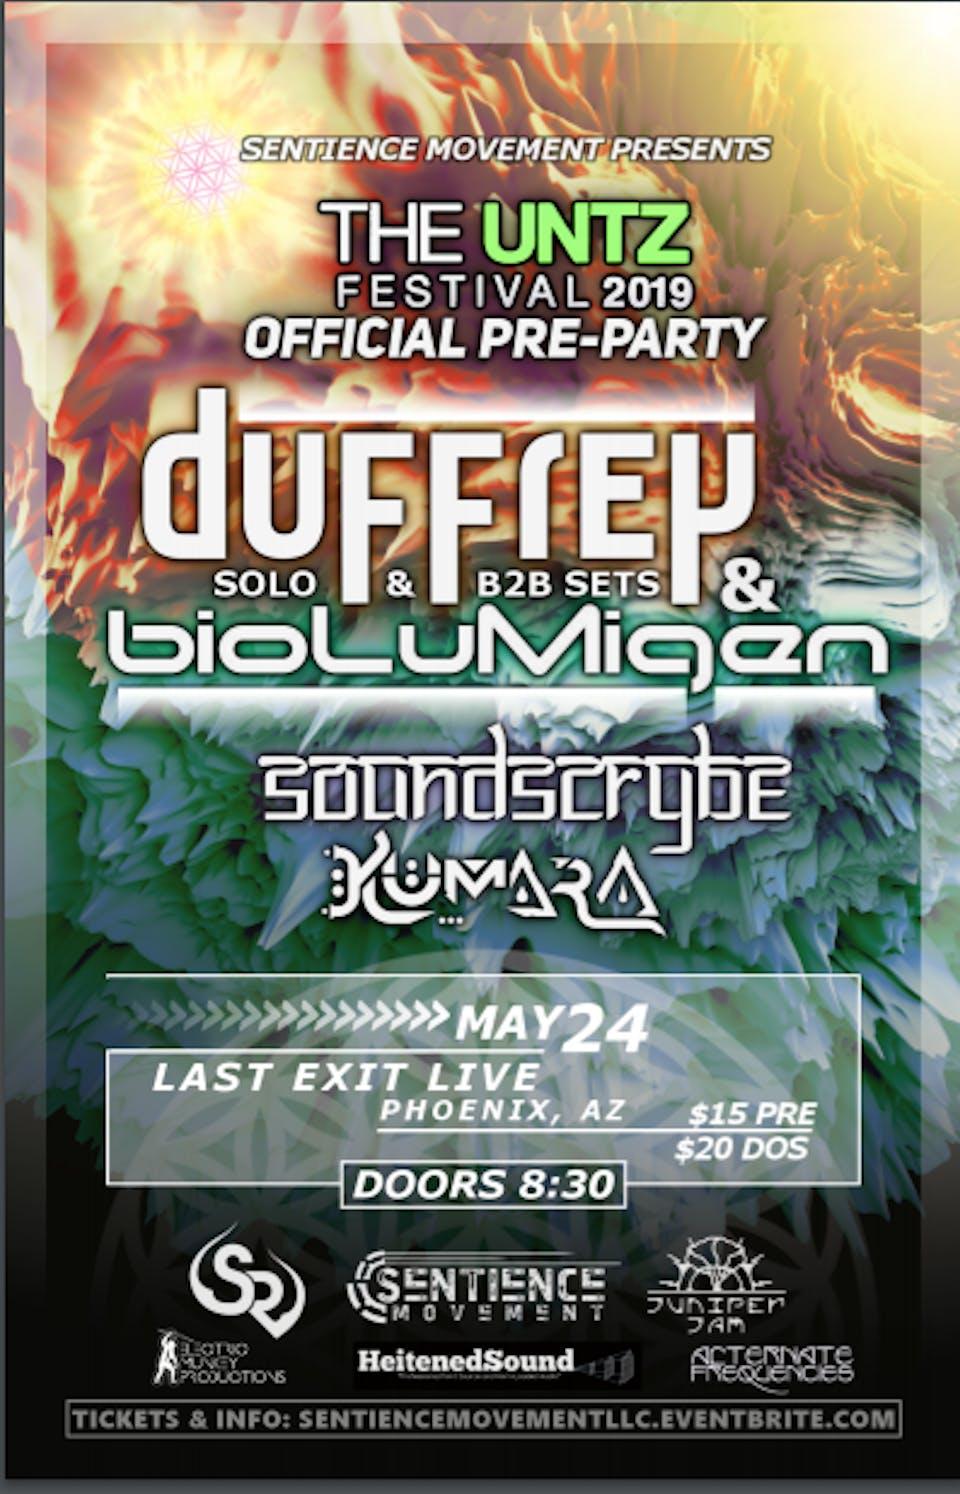 Duffrey & bioLuMigen